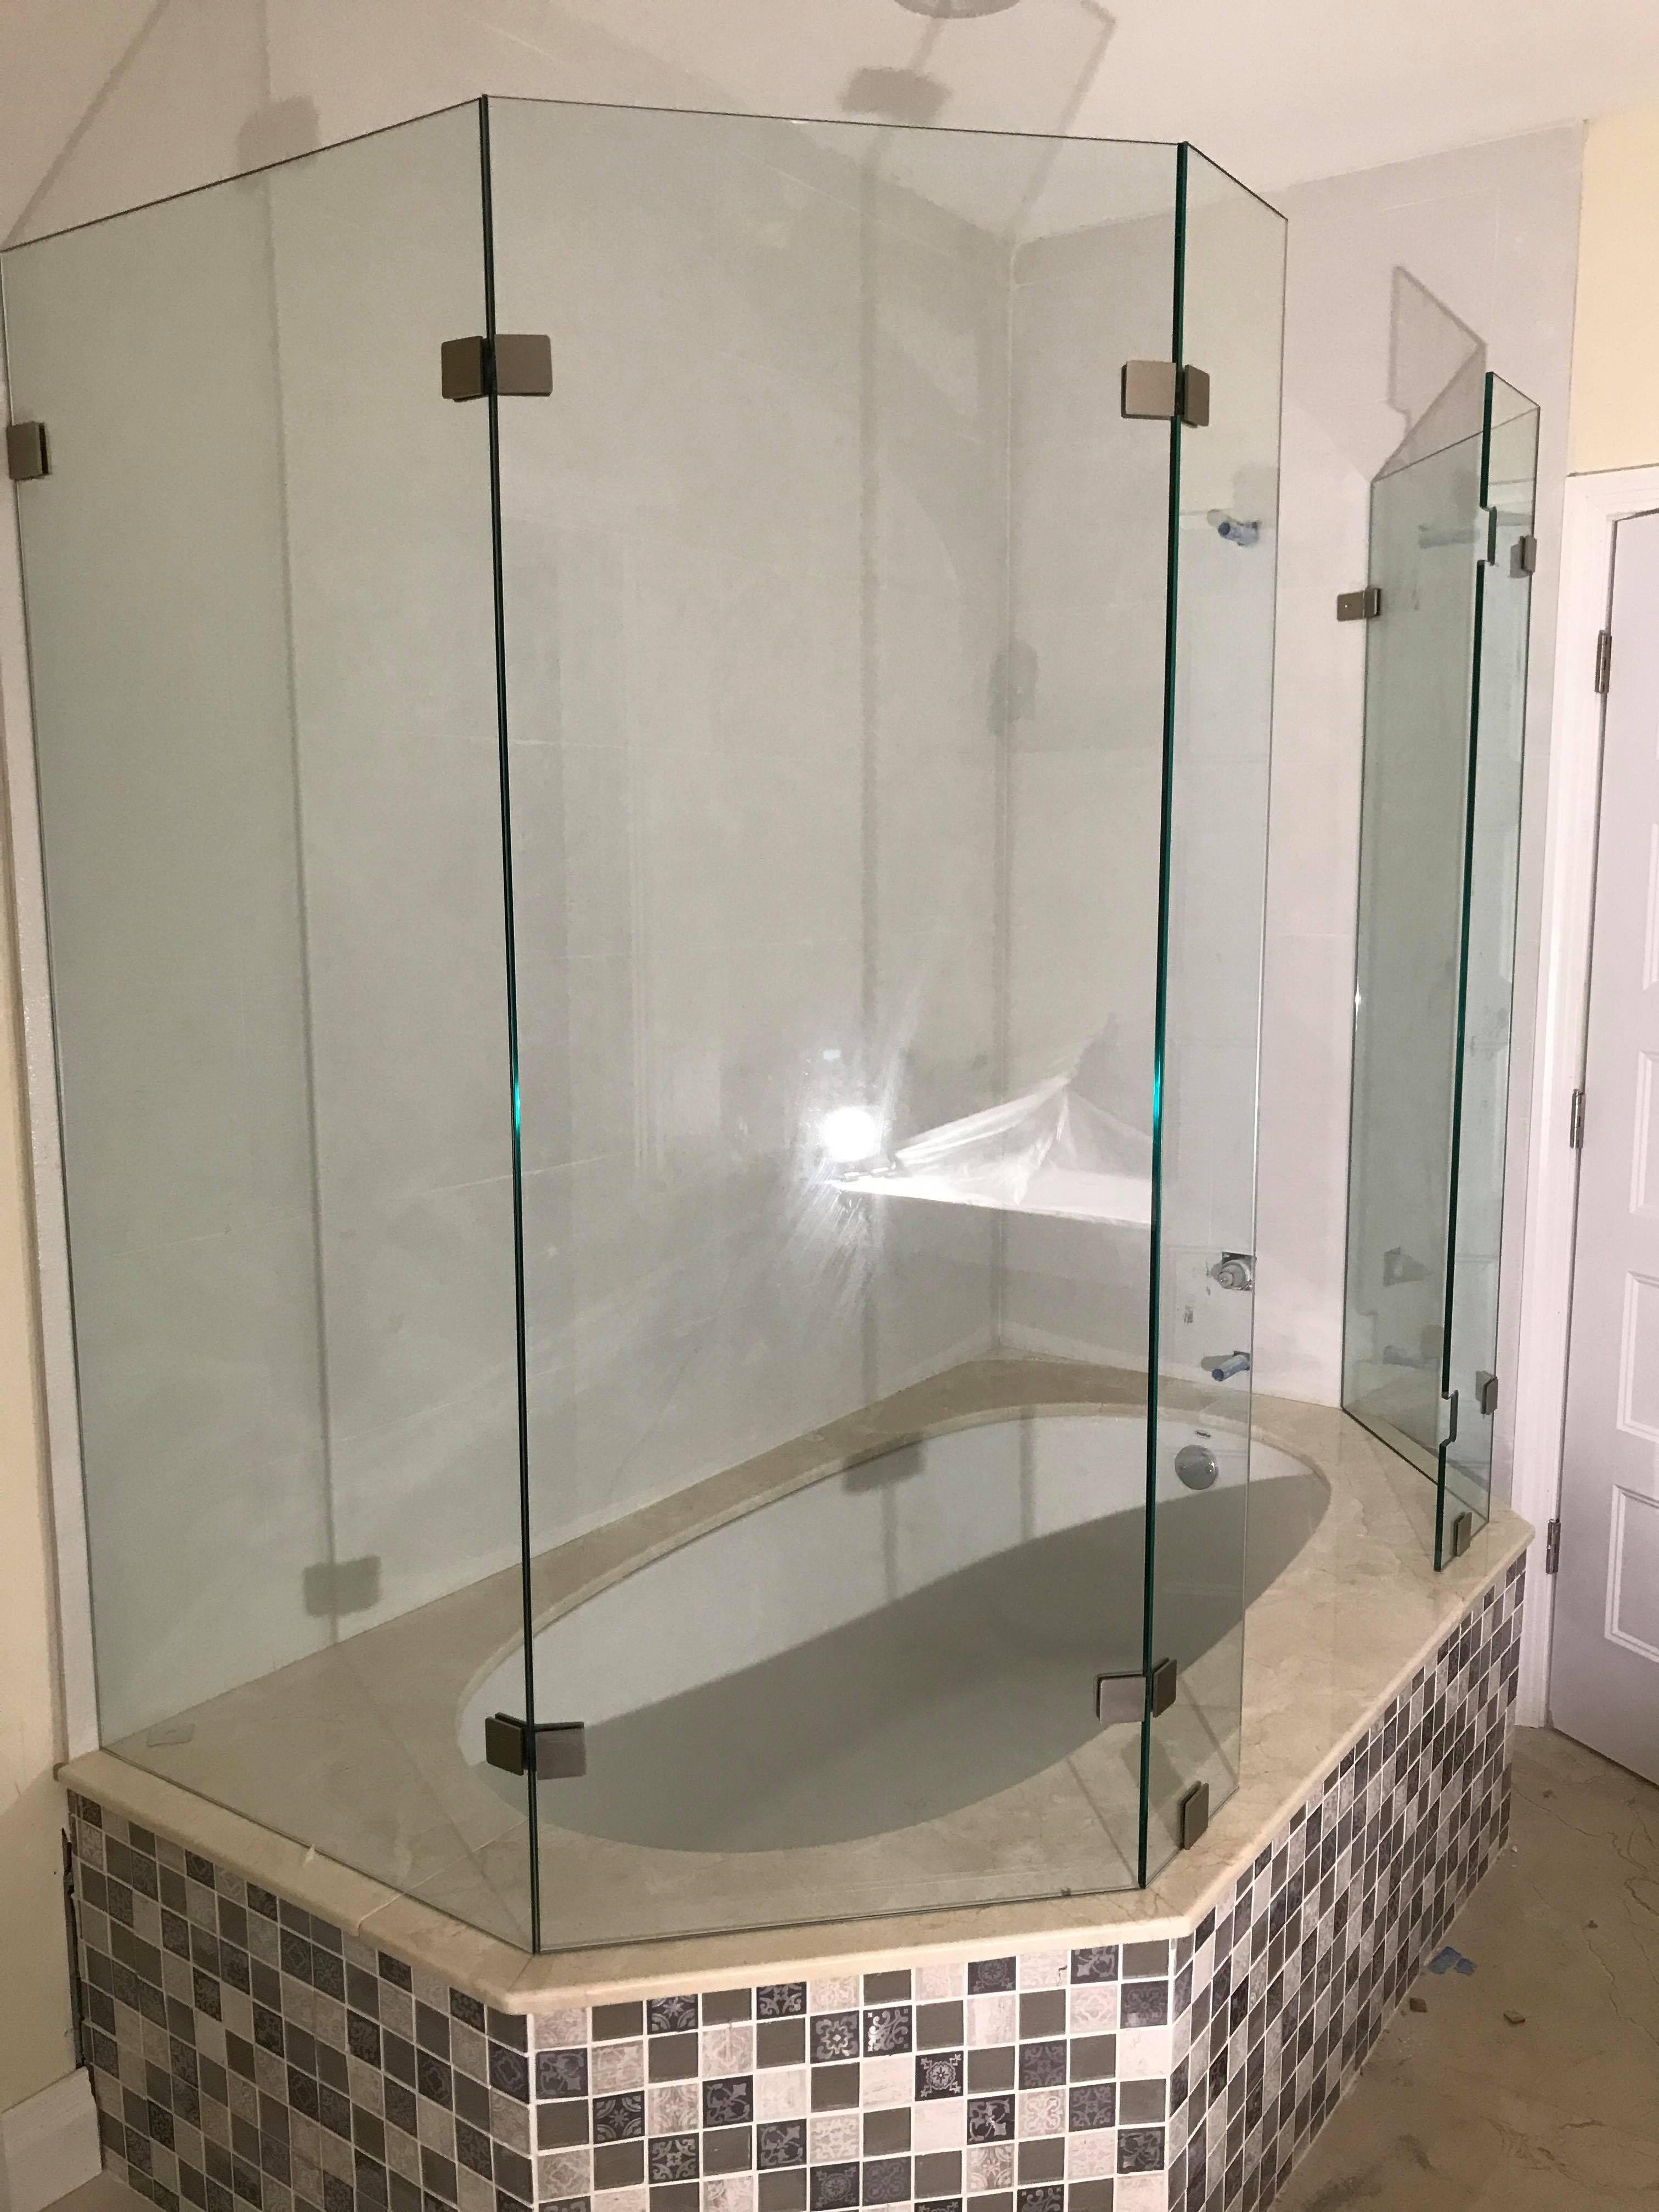 Shower Ducha Enclosure Miami Florida Bathtub Shower Doors